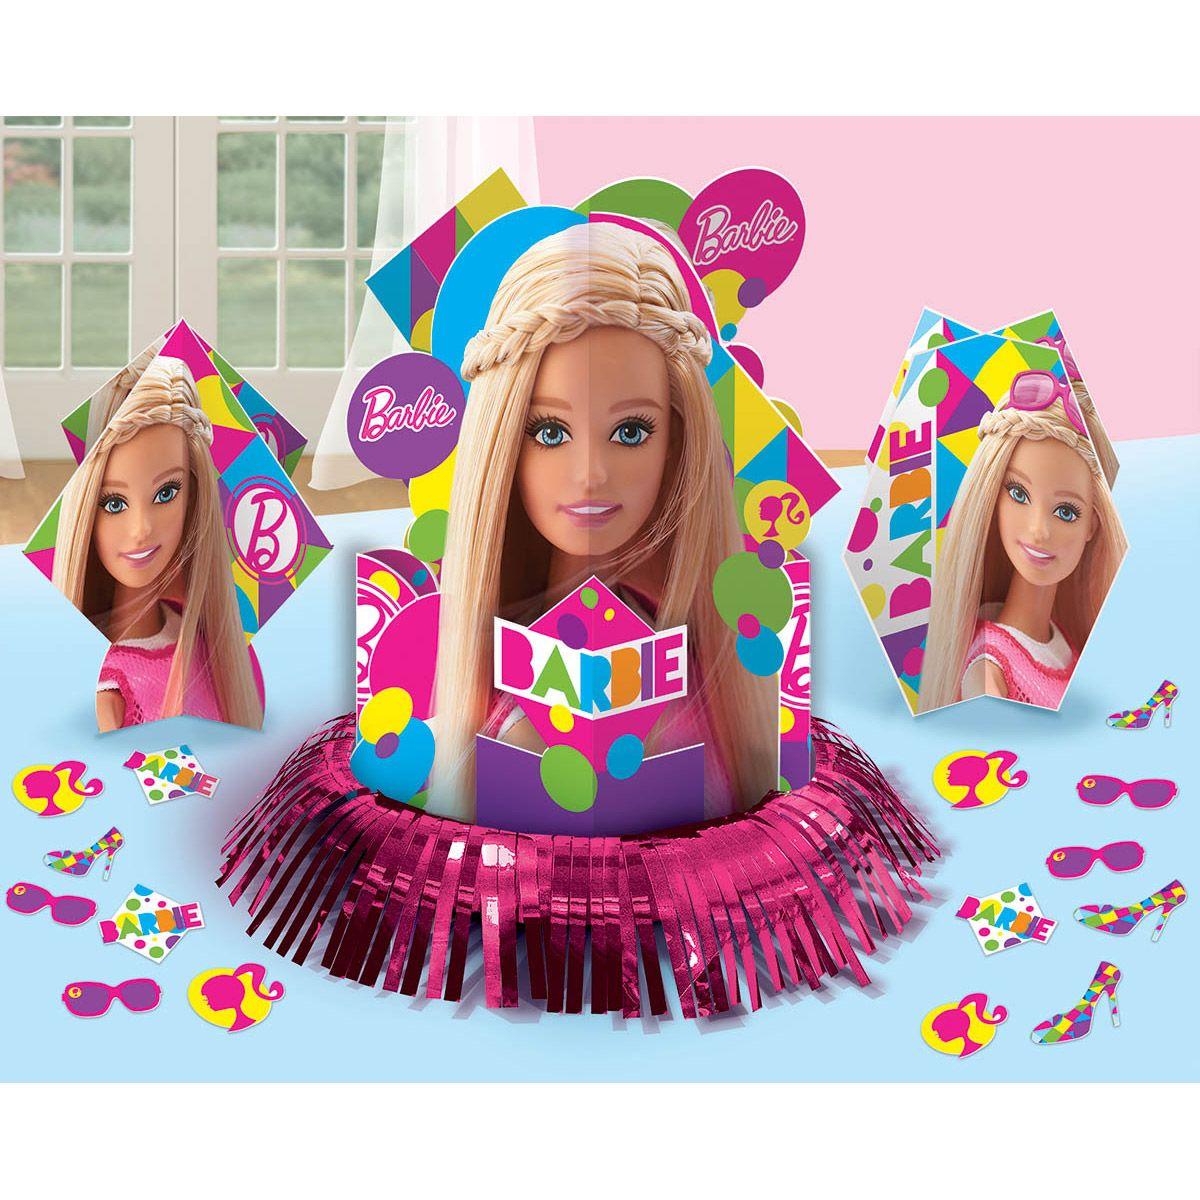 Barbie Sparkle Table Decorating Kit - Party Supplies